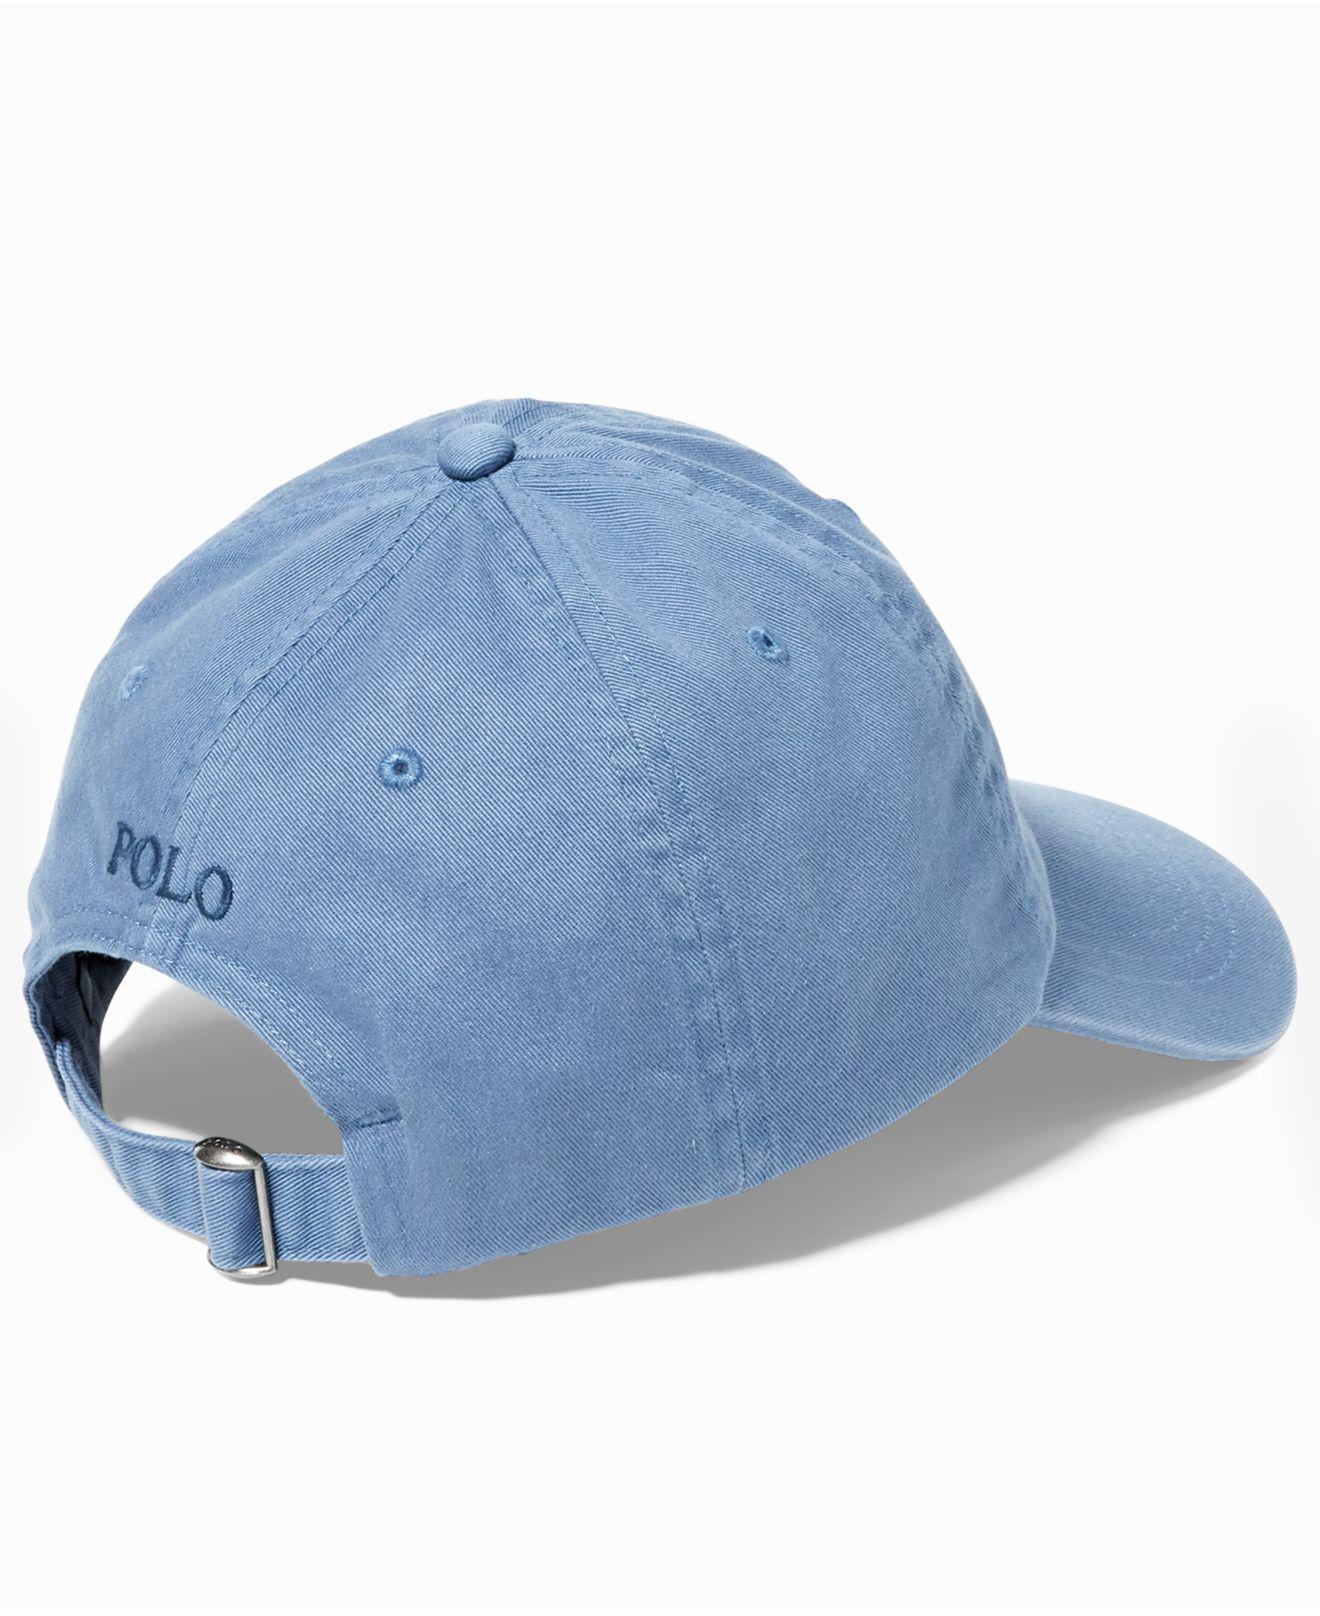 98e420c8a4e Lyst - Polo Ralph Lauren Classic Sport Cap in Blue for Men - Save 39%